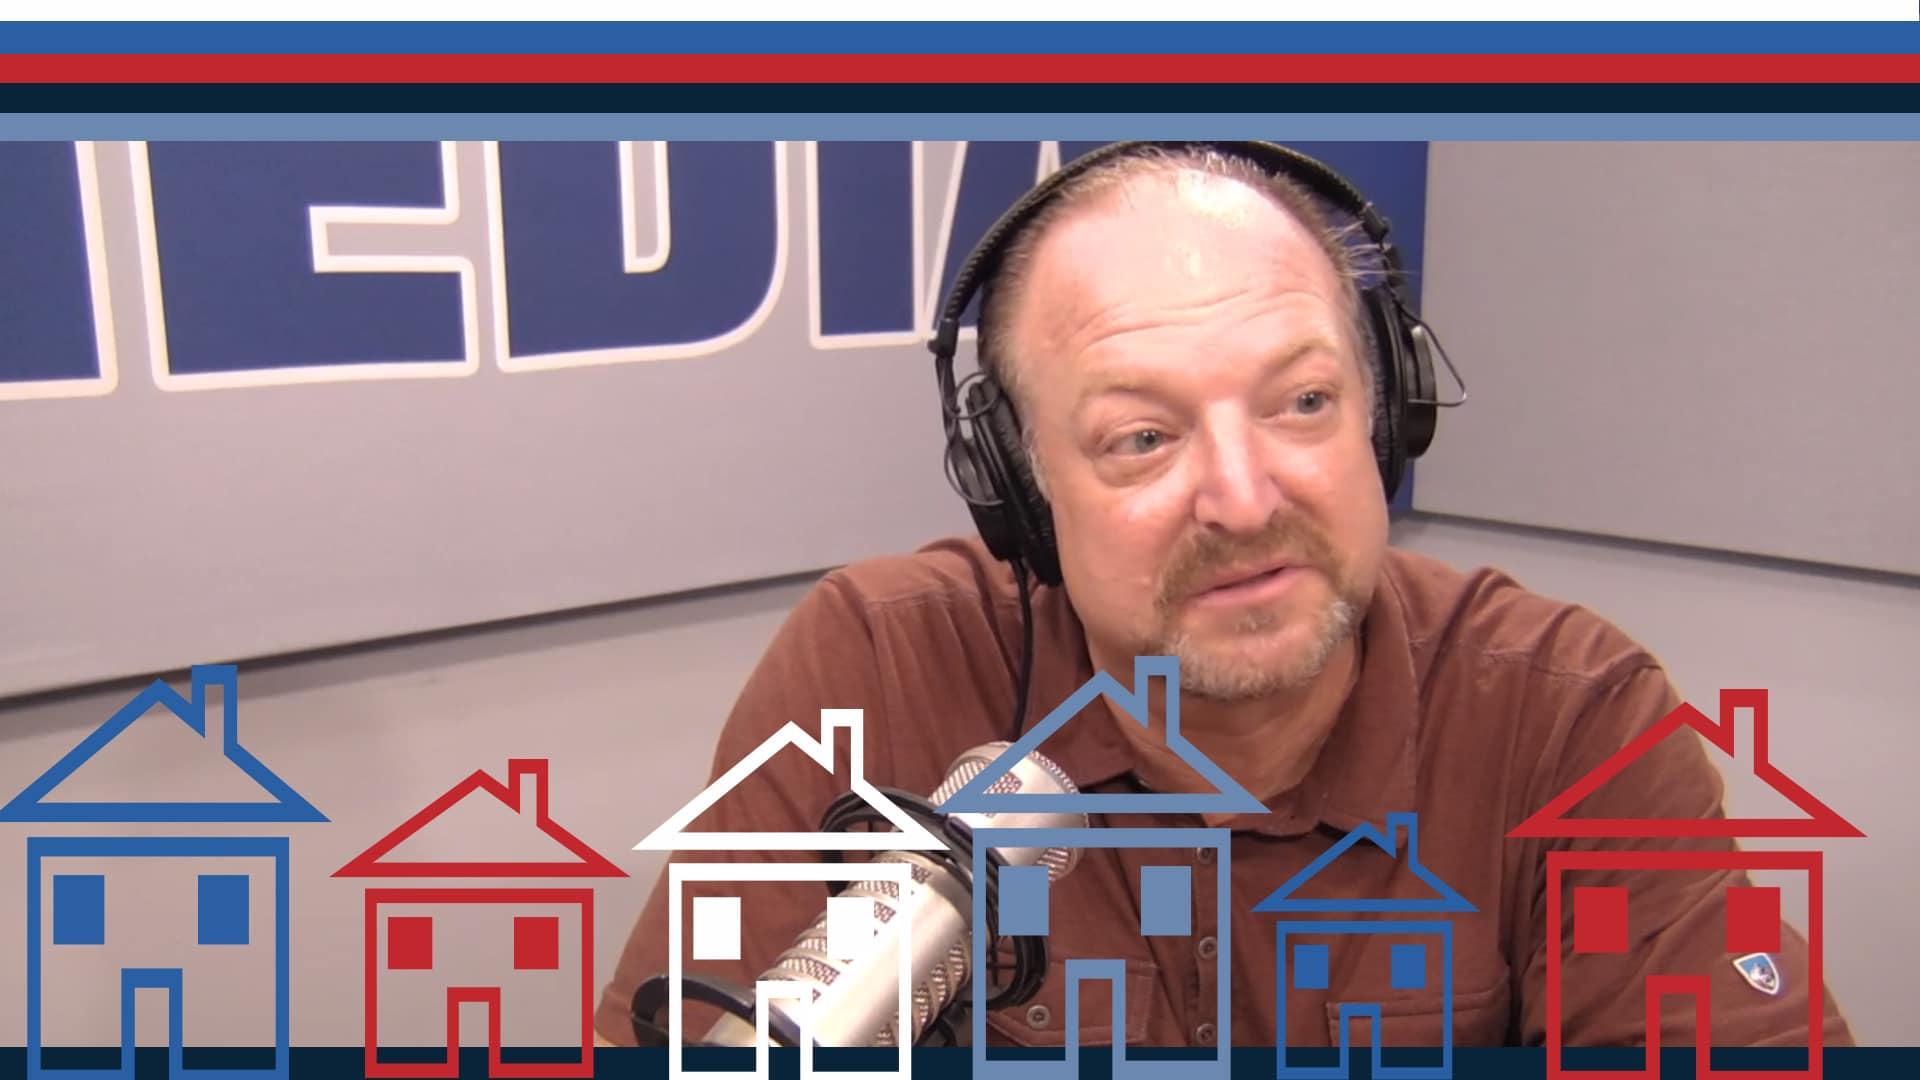 Real Estate Realities - Episode 6